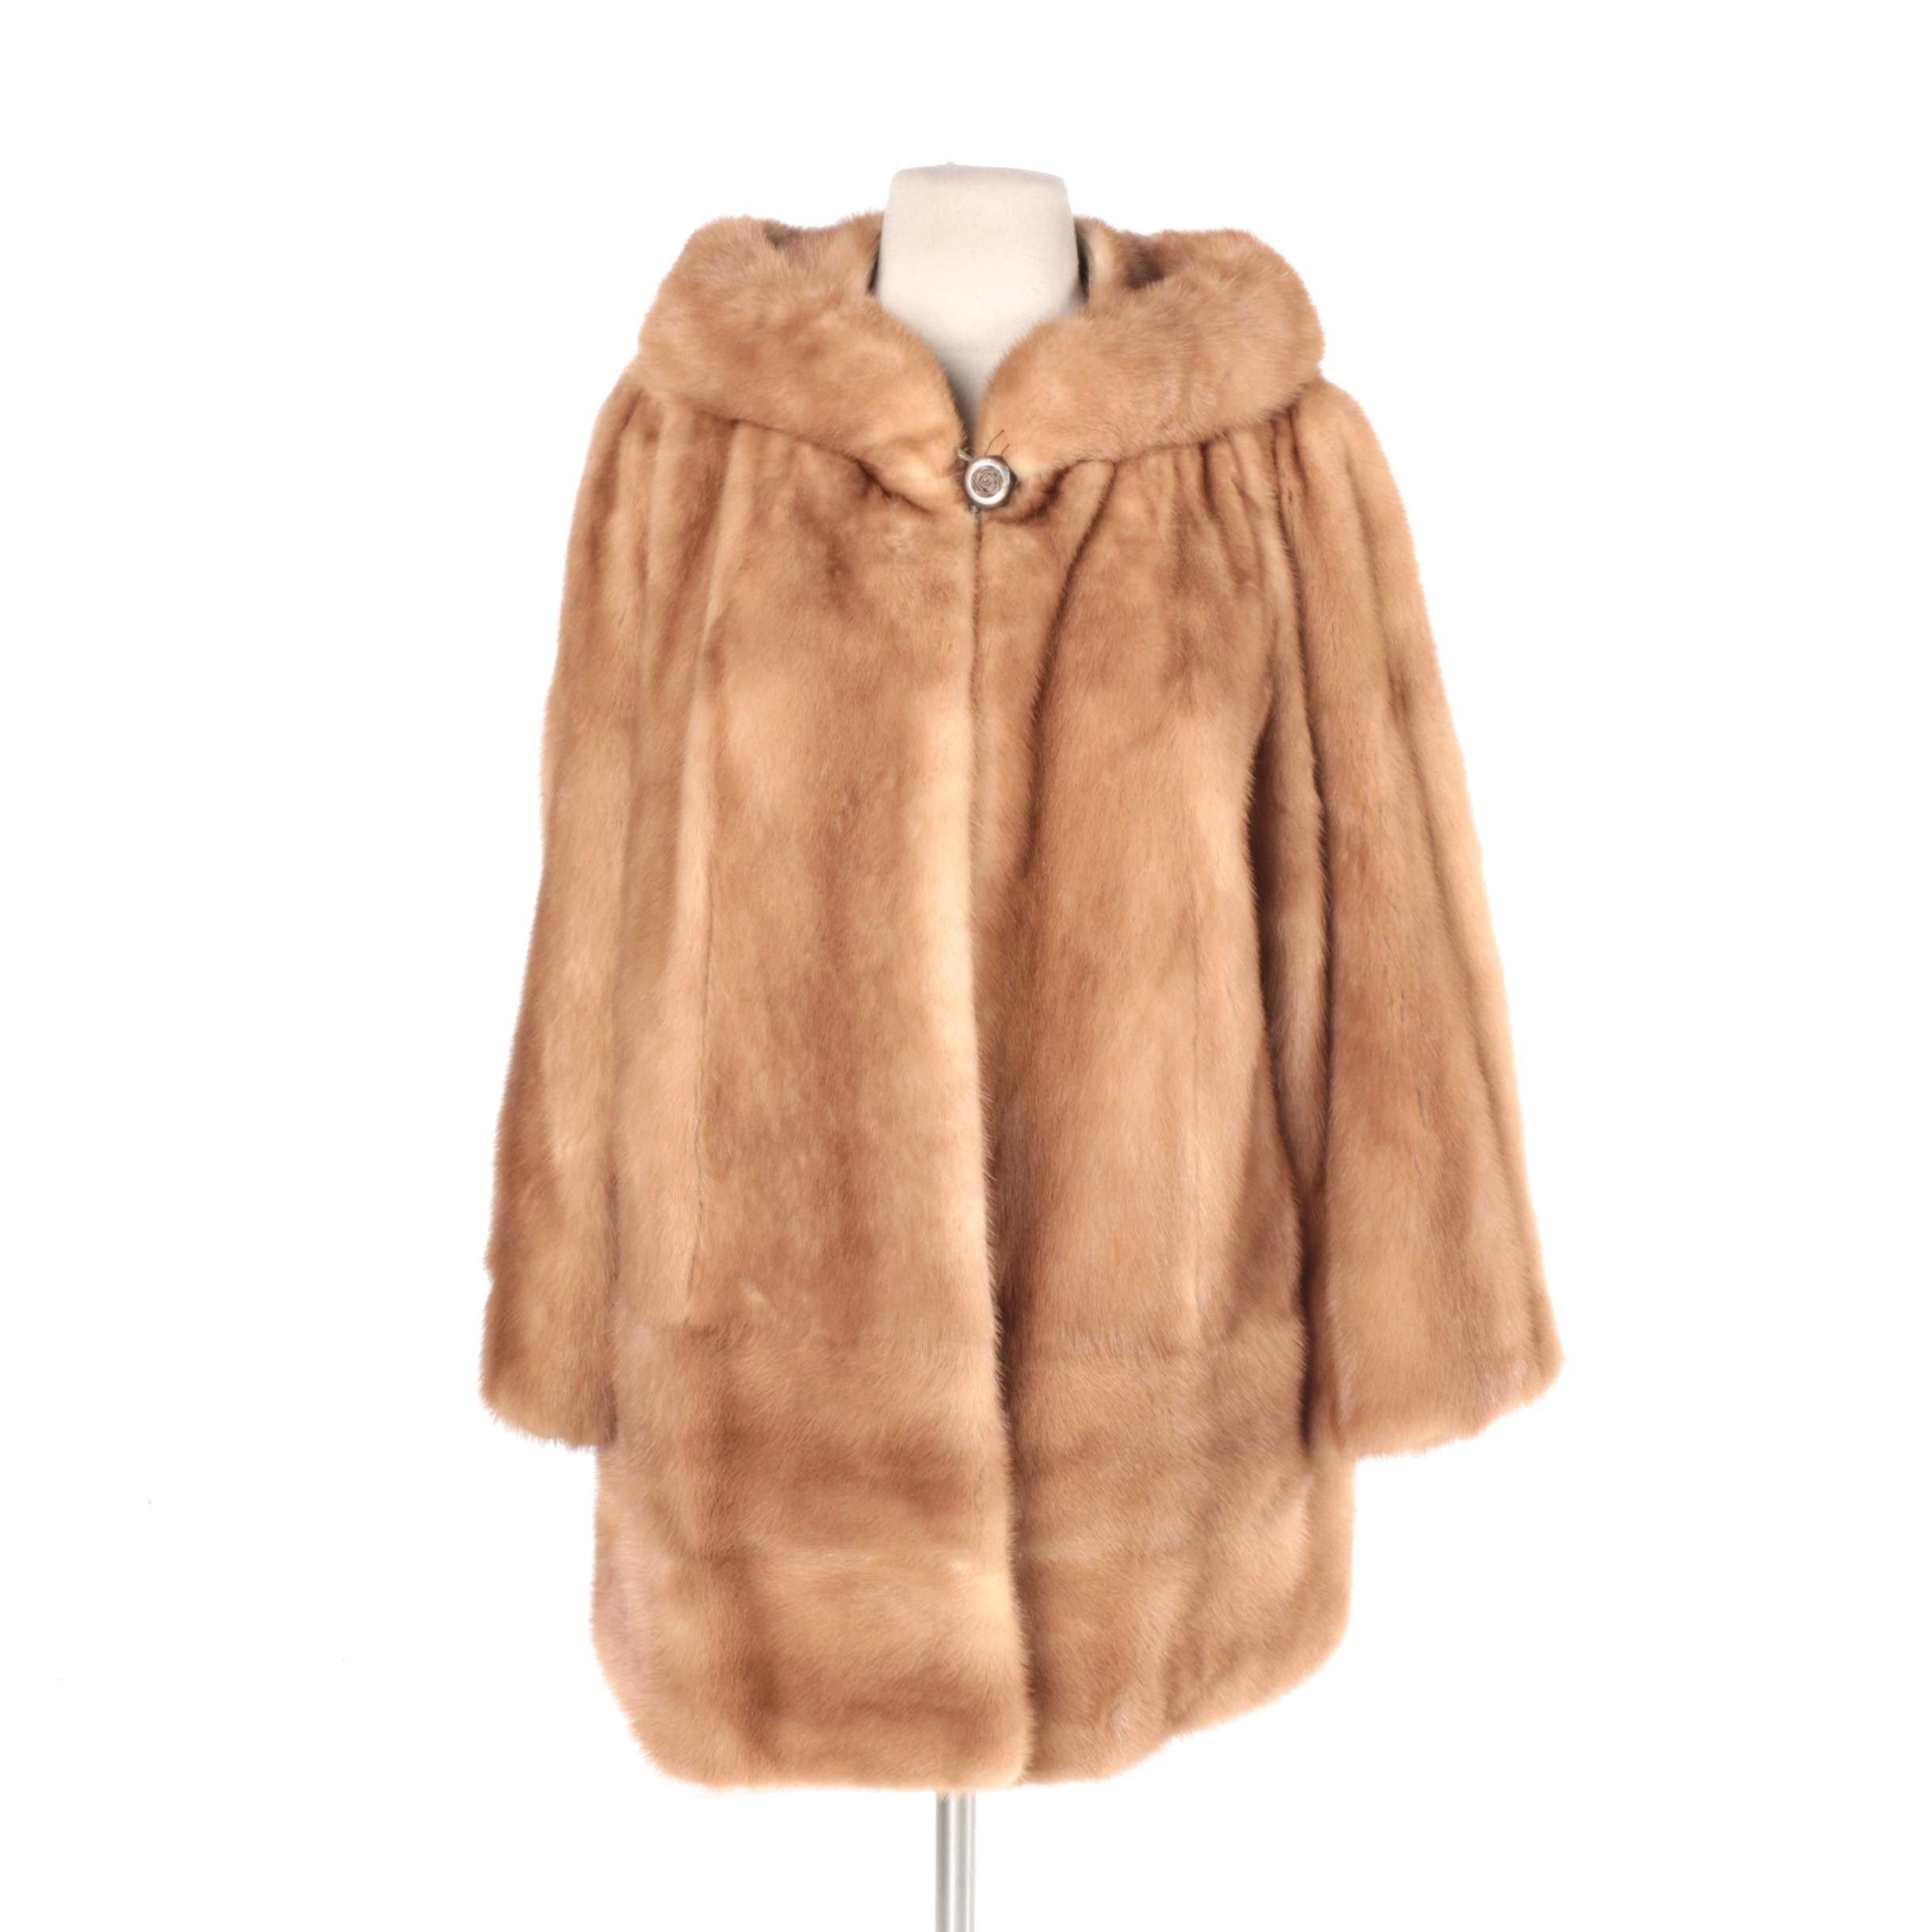 Women's Vintage Light Brown Mink Fur Coat